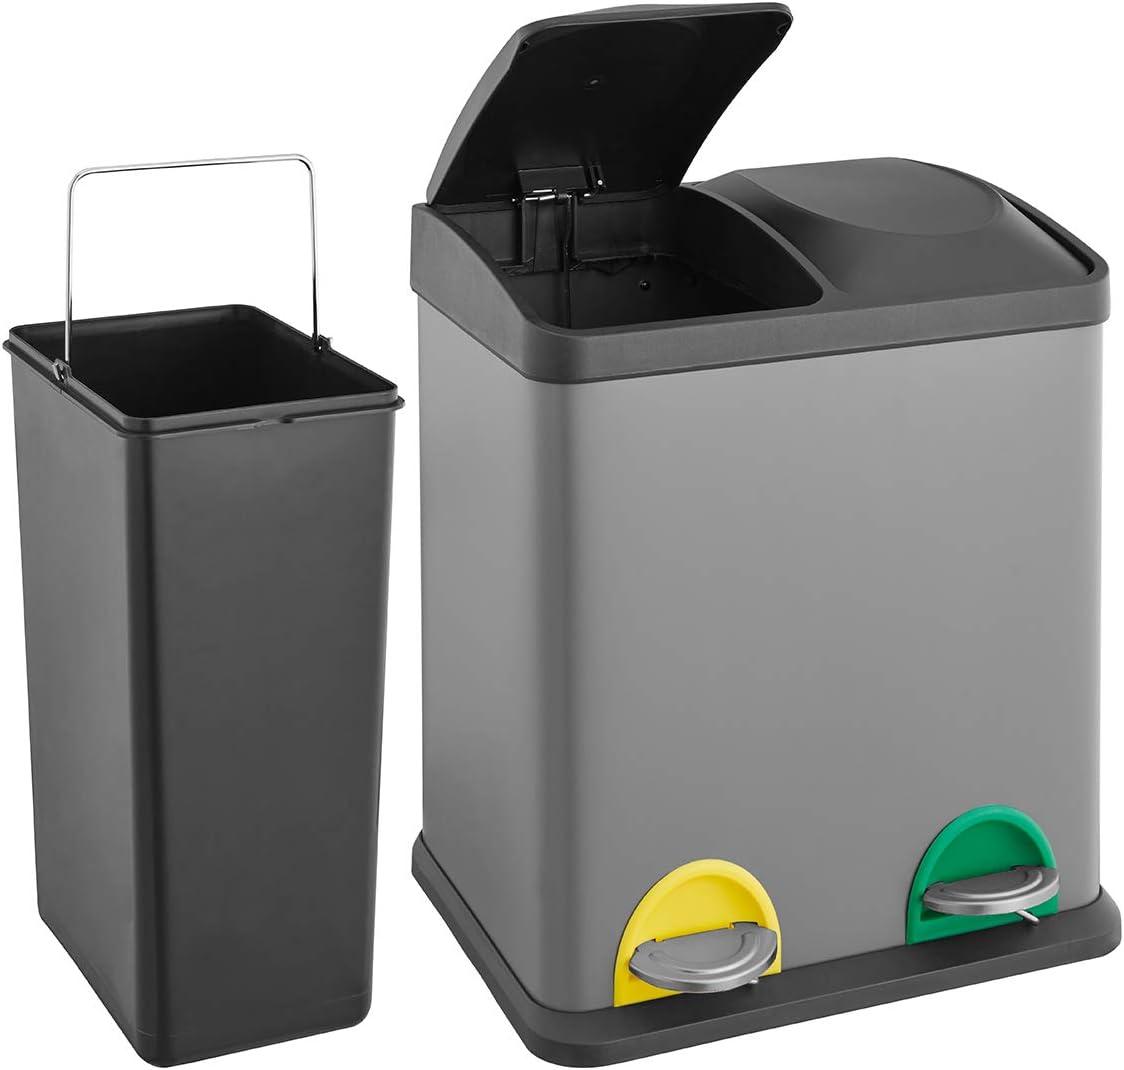 SVITA TC2000X2000 Küchen-Eimer grau 2000 Liter 2000x2000L doppelt Abfalleimer  2000er-Mülleimer Mülltrennung Treteimer